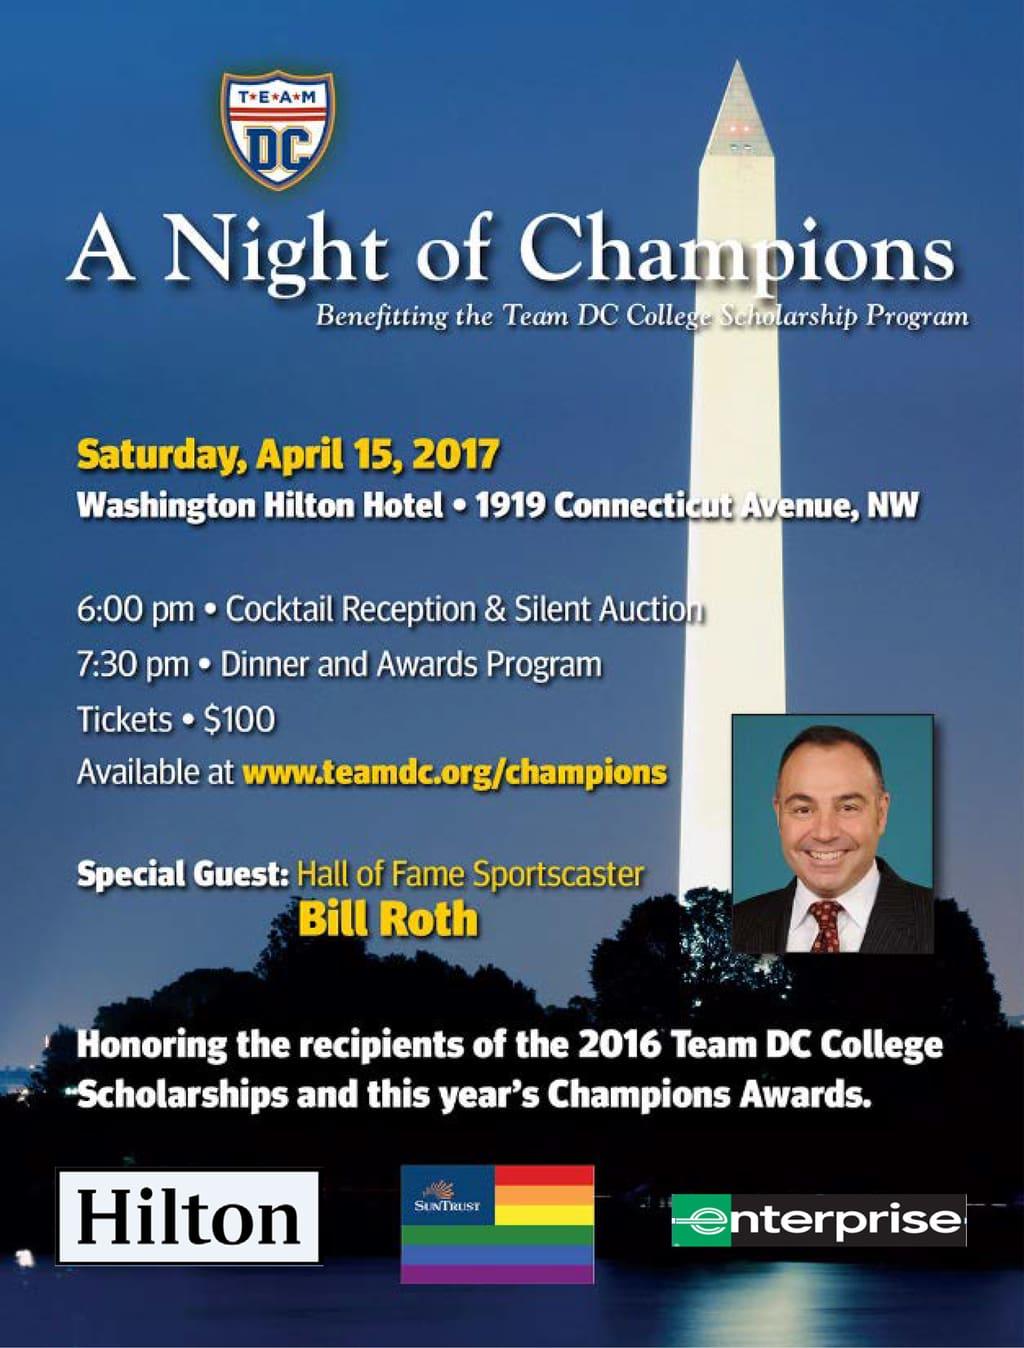 Night of Champions Awards Dinner